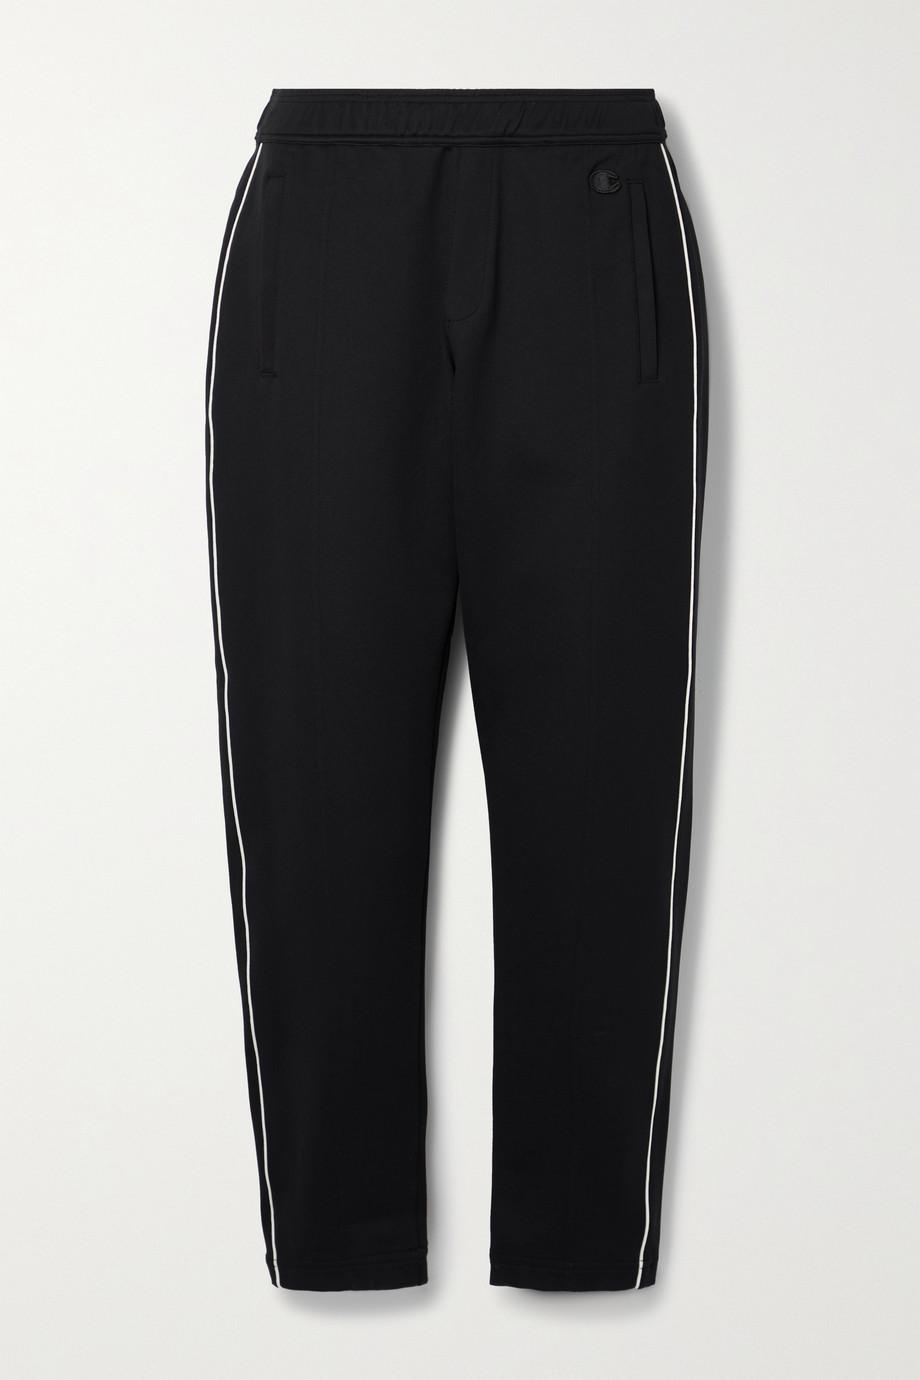 Nili Lotan + Champion appliquéd stretch-jersey track pants